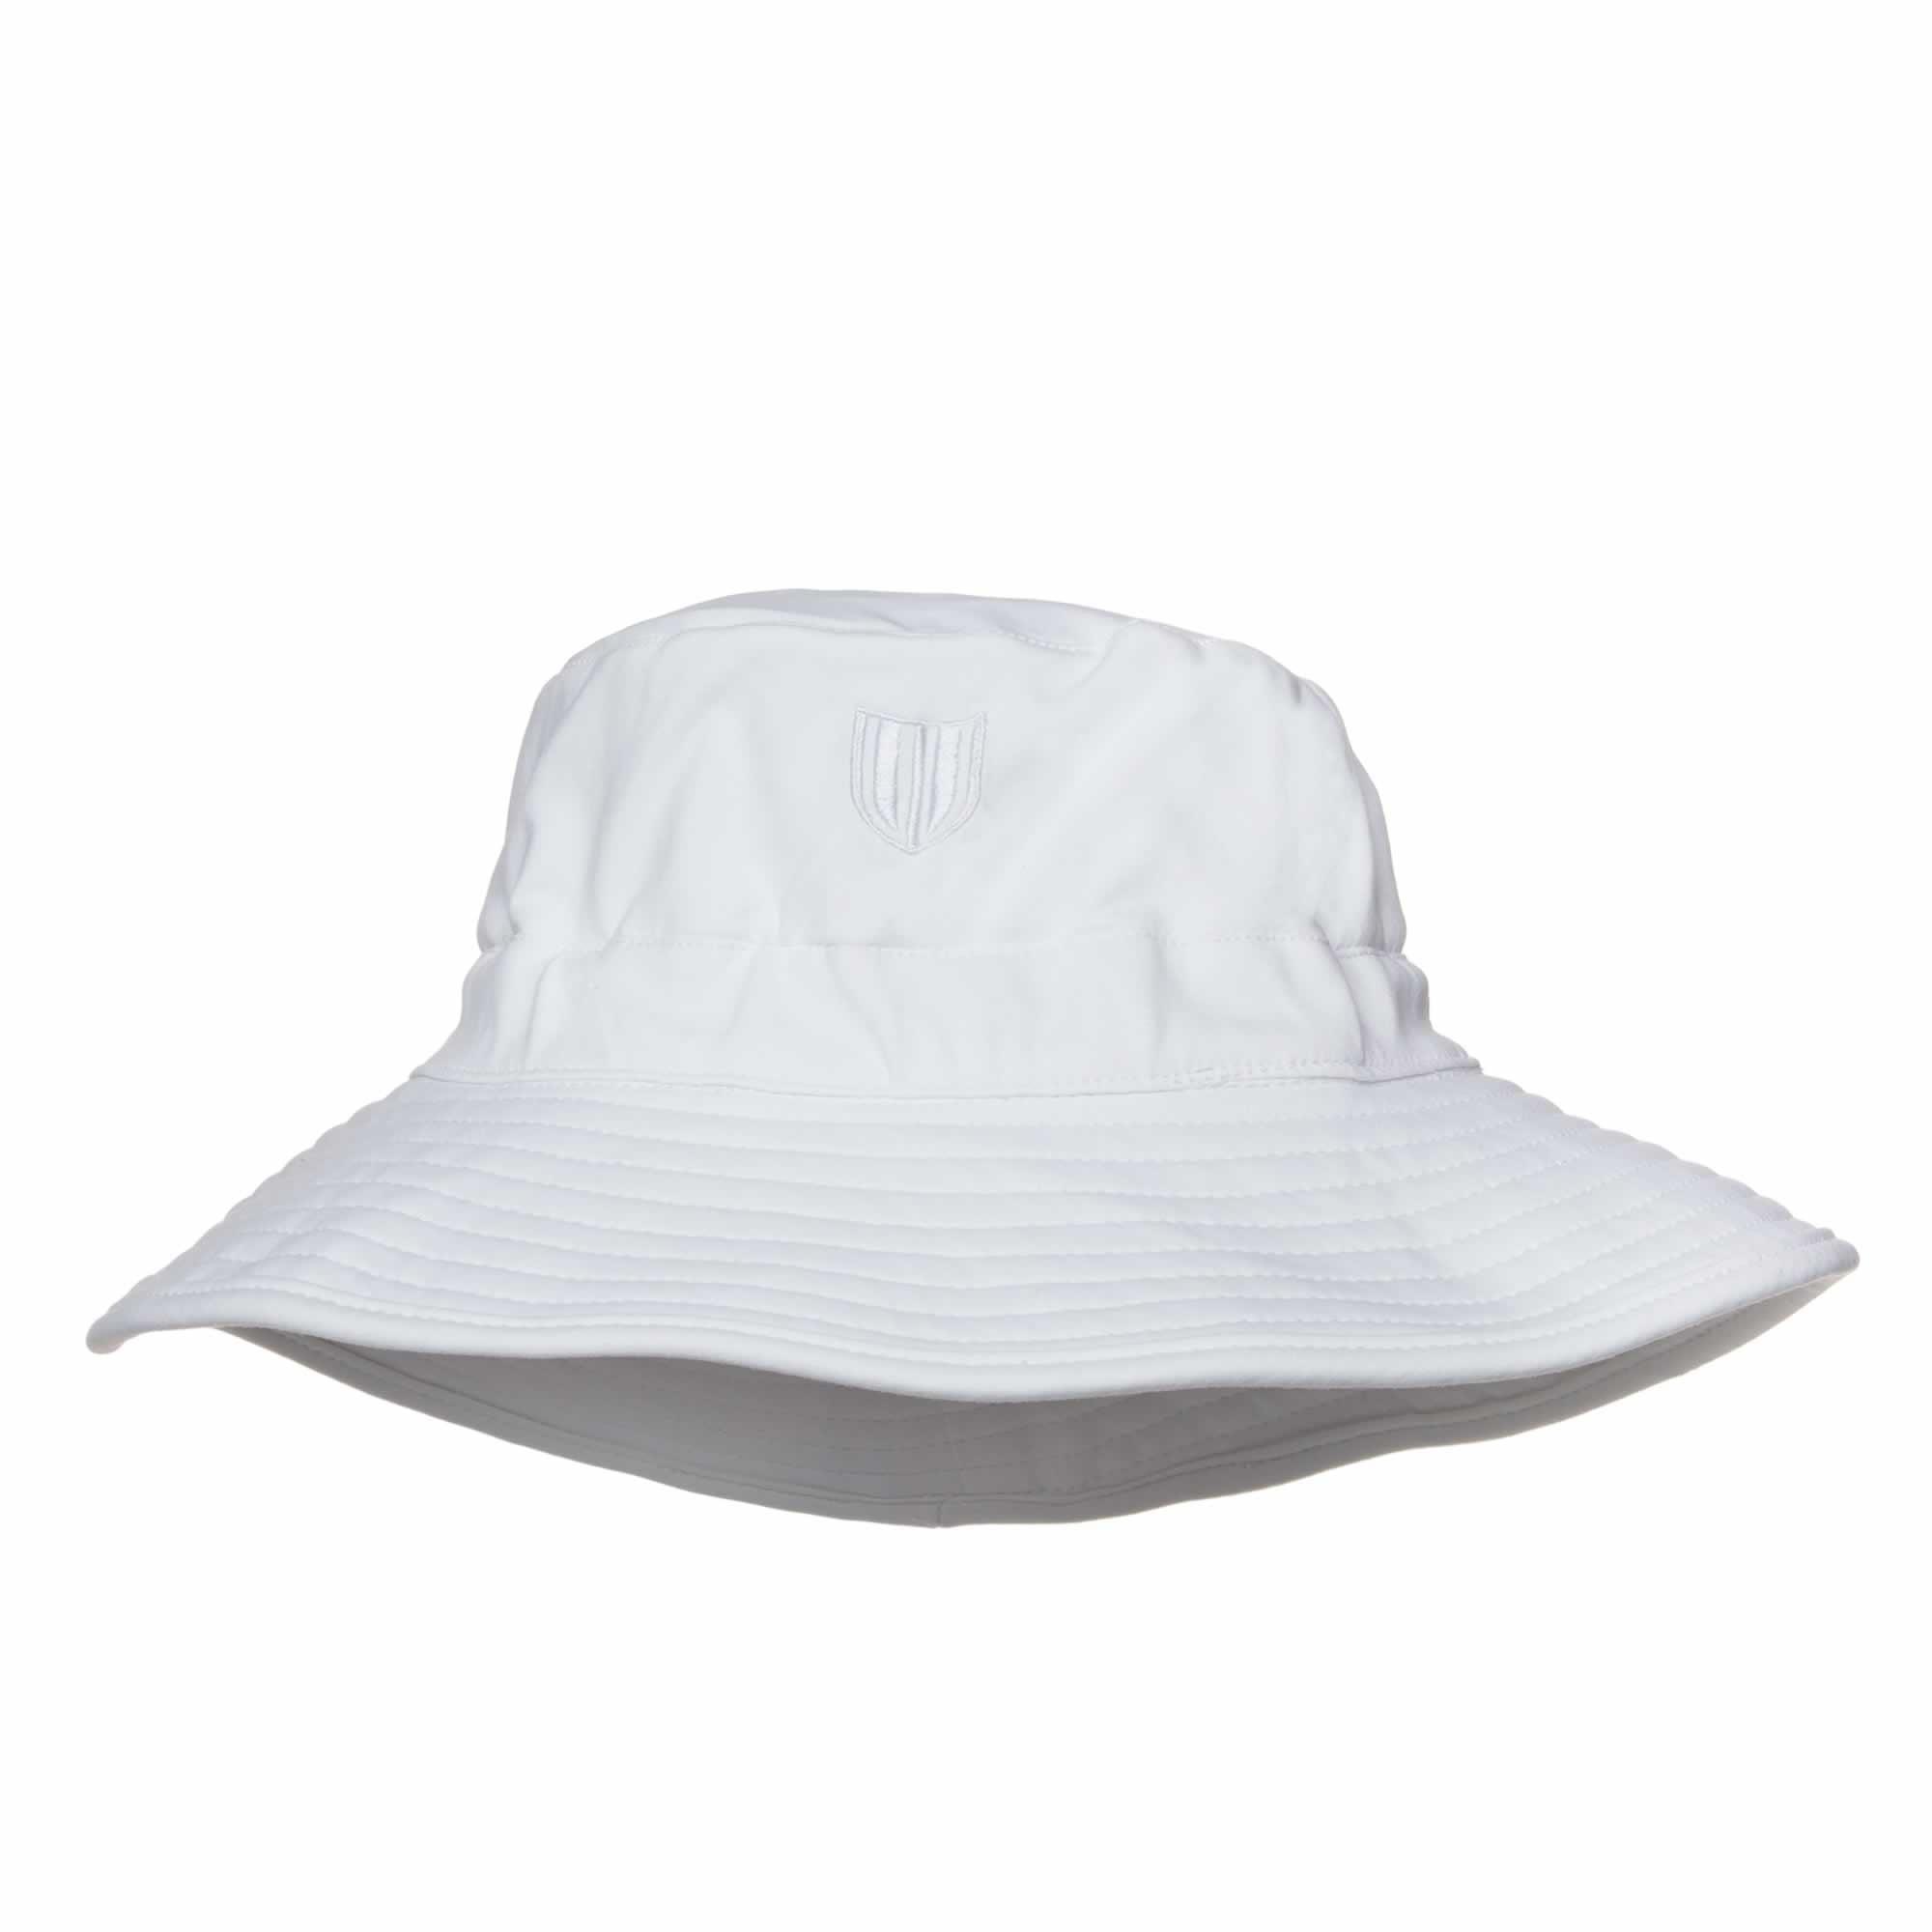 UV-Blocker - UV-Blocker Womens White Bucket Hat S-M - Walmart.com c899d79c0